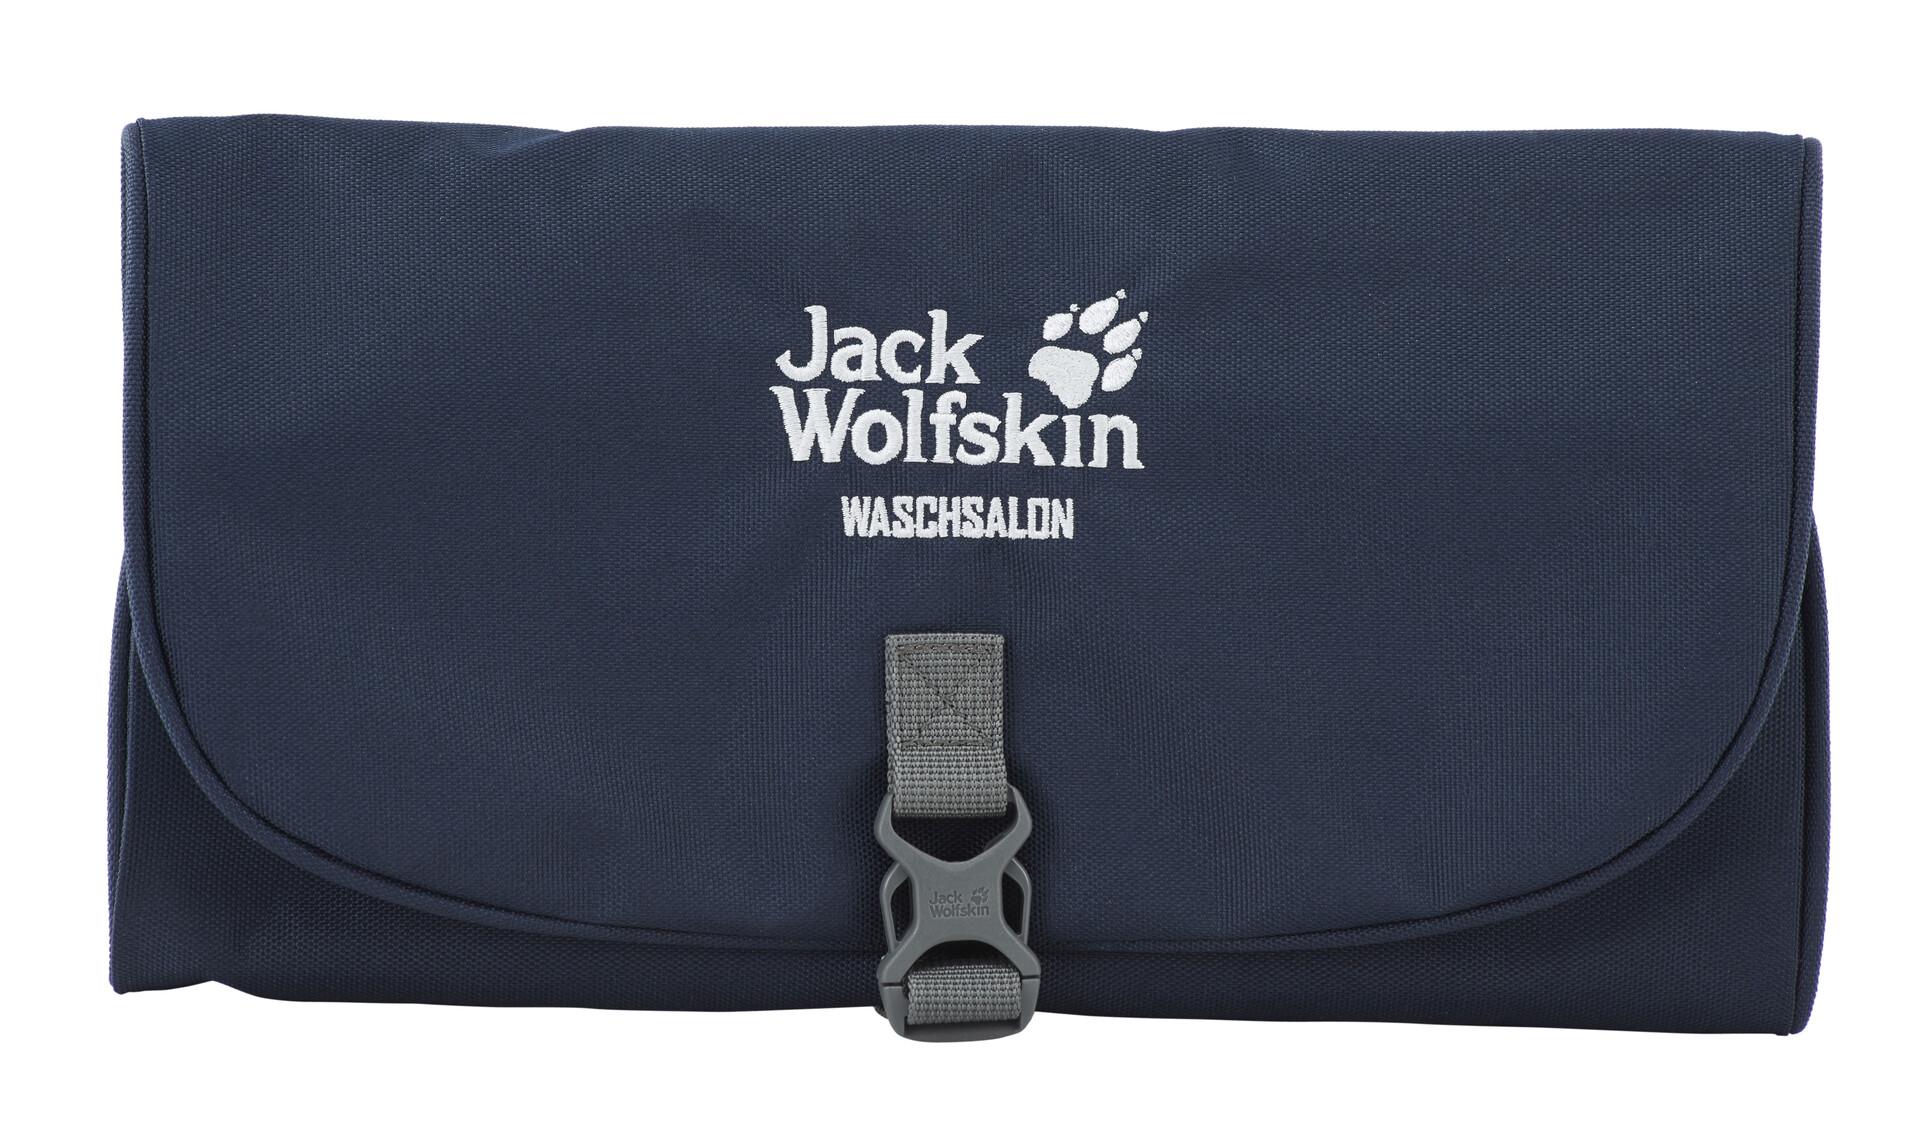 Jack Wolfskin Kulturbeutel Waschsalon Koffer, Rucksäcke